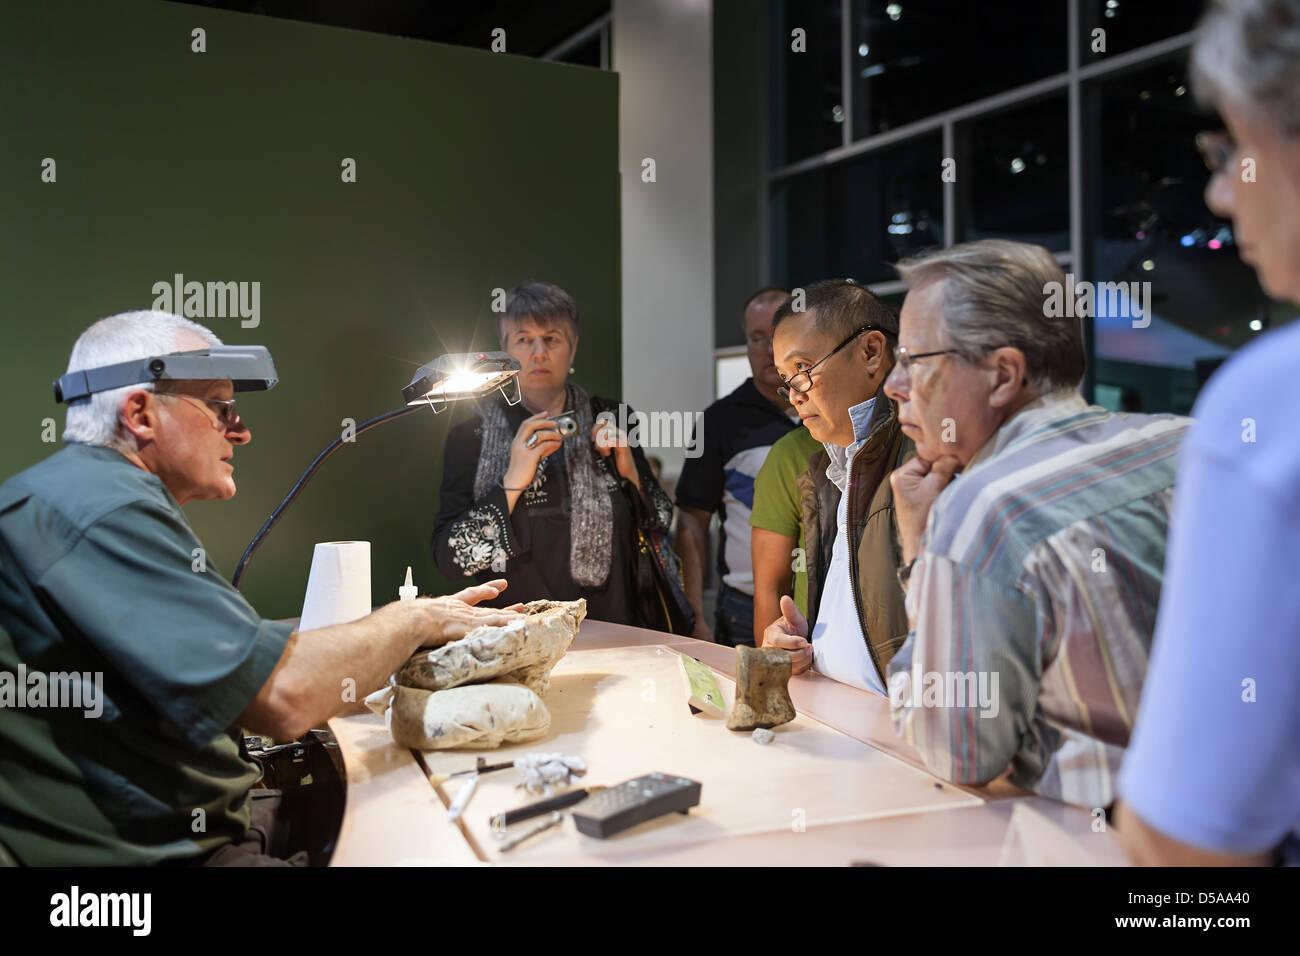 Palaeontology fossil interpretation, Royal Tyrrell Museum, Drumheller, Alberta, Canada - Stock Image